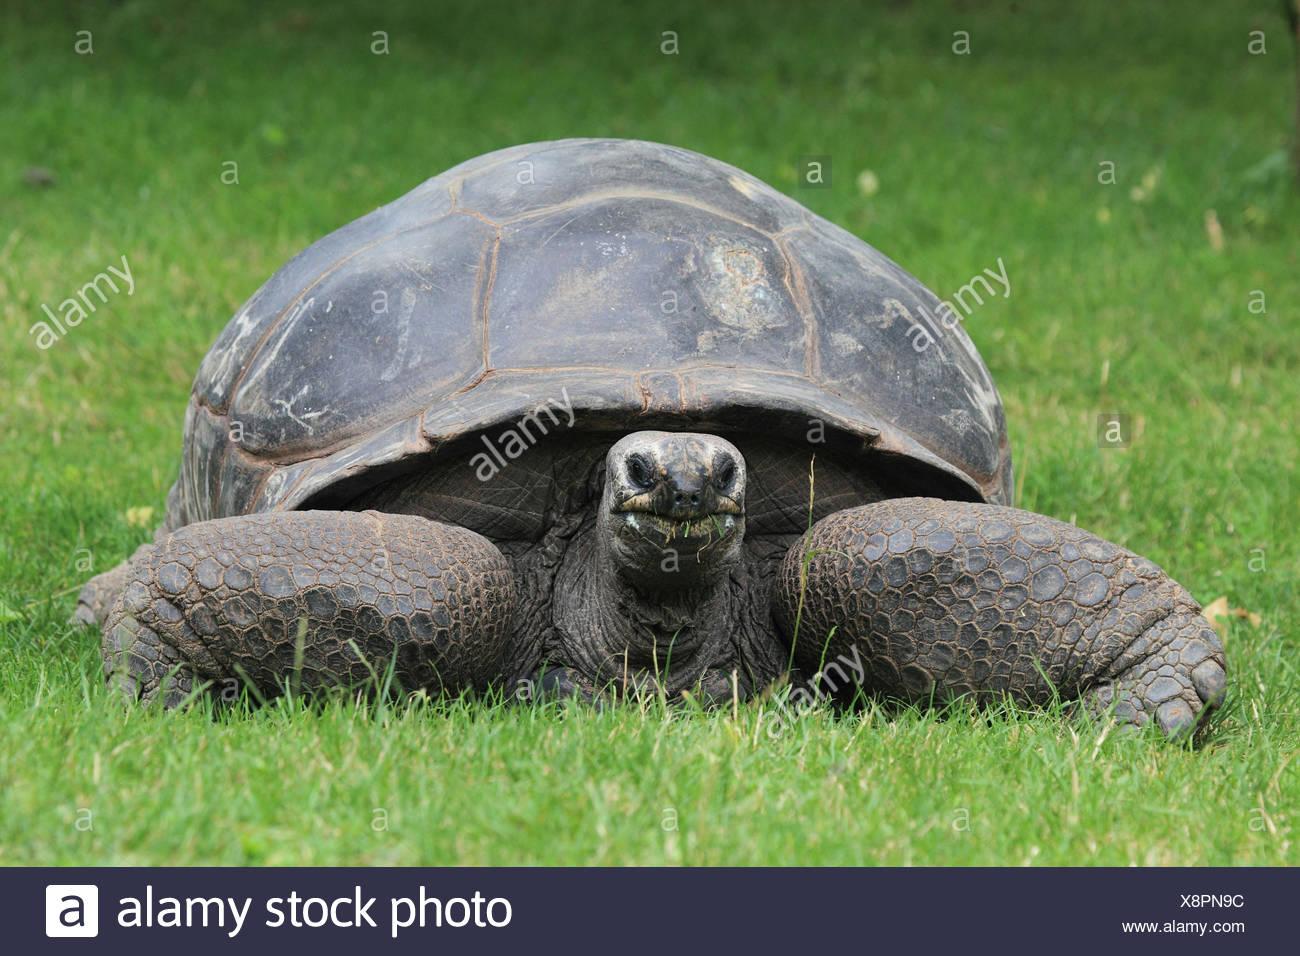 The Seychelles gigantic tortoise, - Stock Image